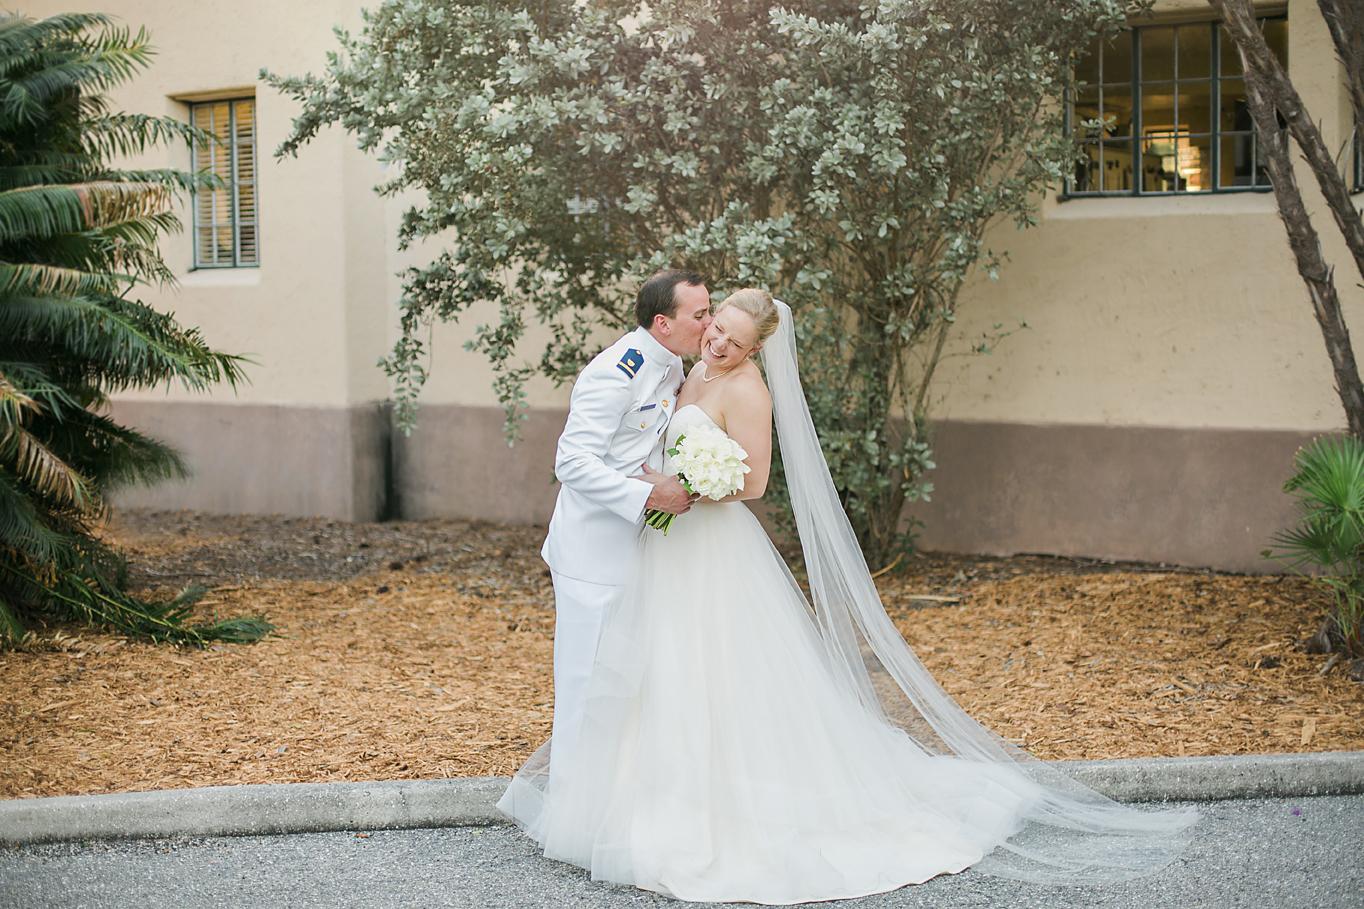 Christi + Mike, Sarasota Wedding Photographer, Crosley Wedding, Couple Photos, Emily & Co. Photography (16) w.jpg